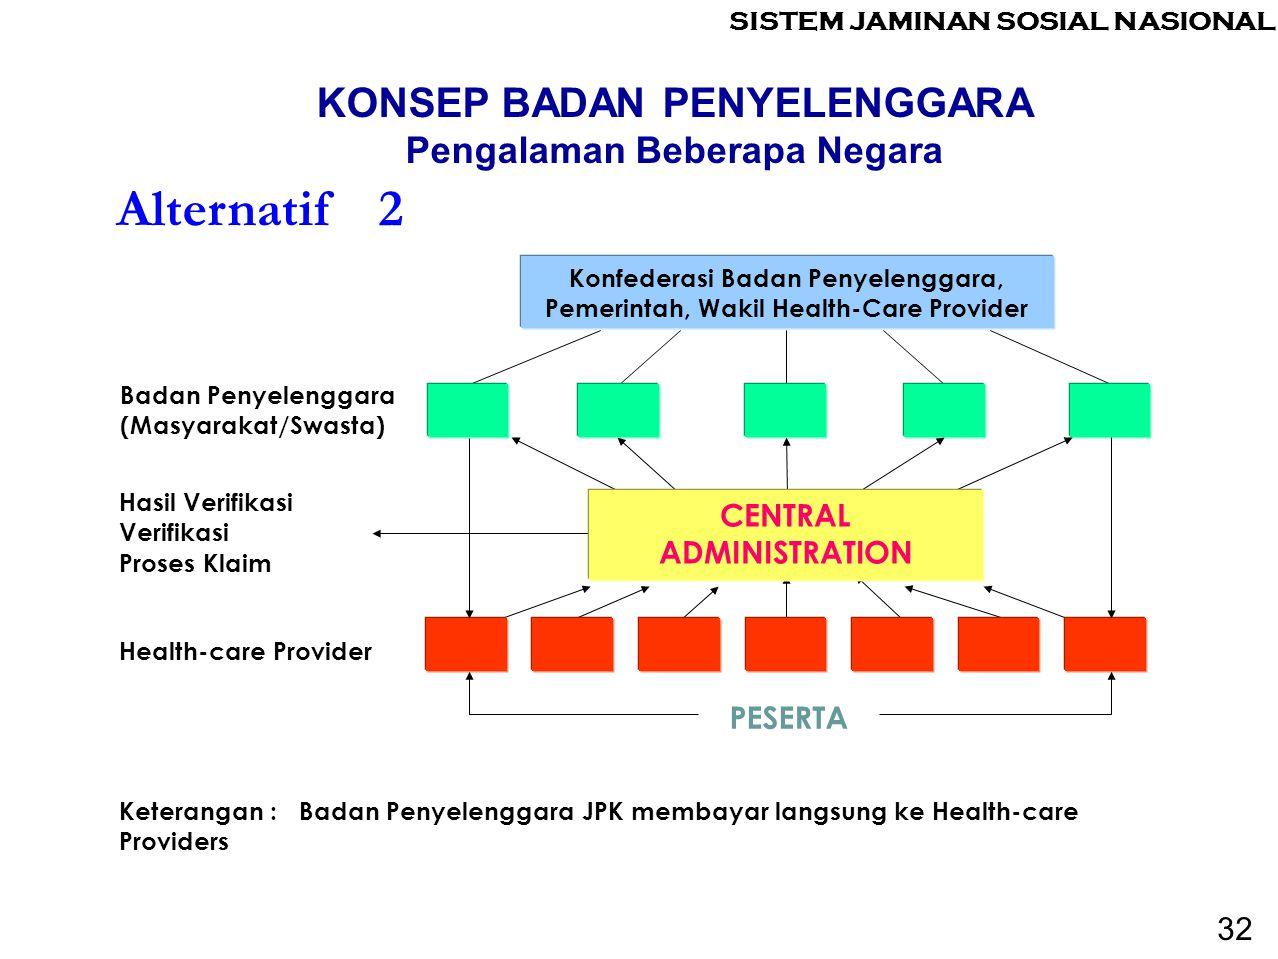 Keterangan : Badan Penyelenggara JPK membayar langsung ke Health-care Providers Health-care Provider PESERTA Alternatif 2 Konfederasi Badan Penyelengg